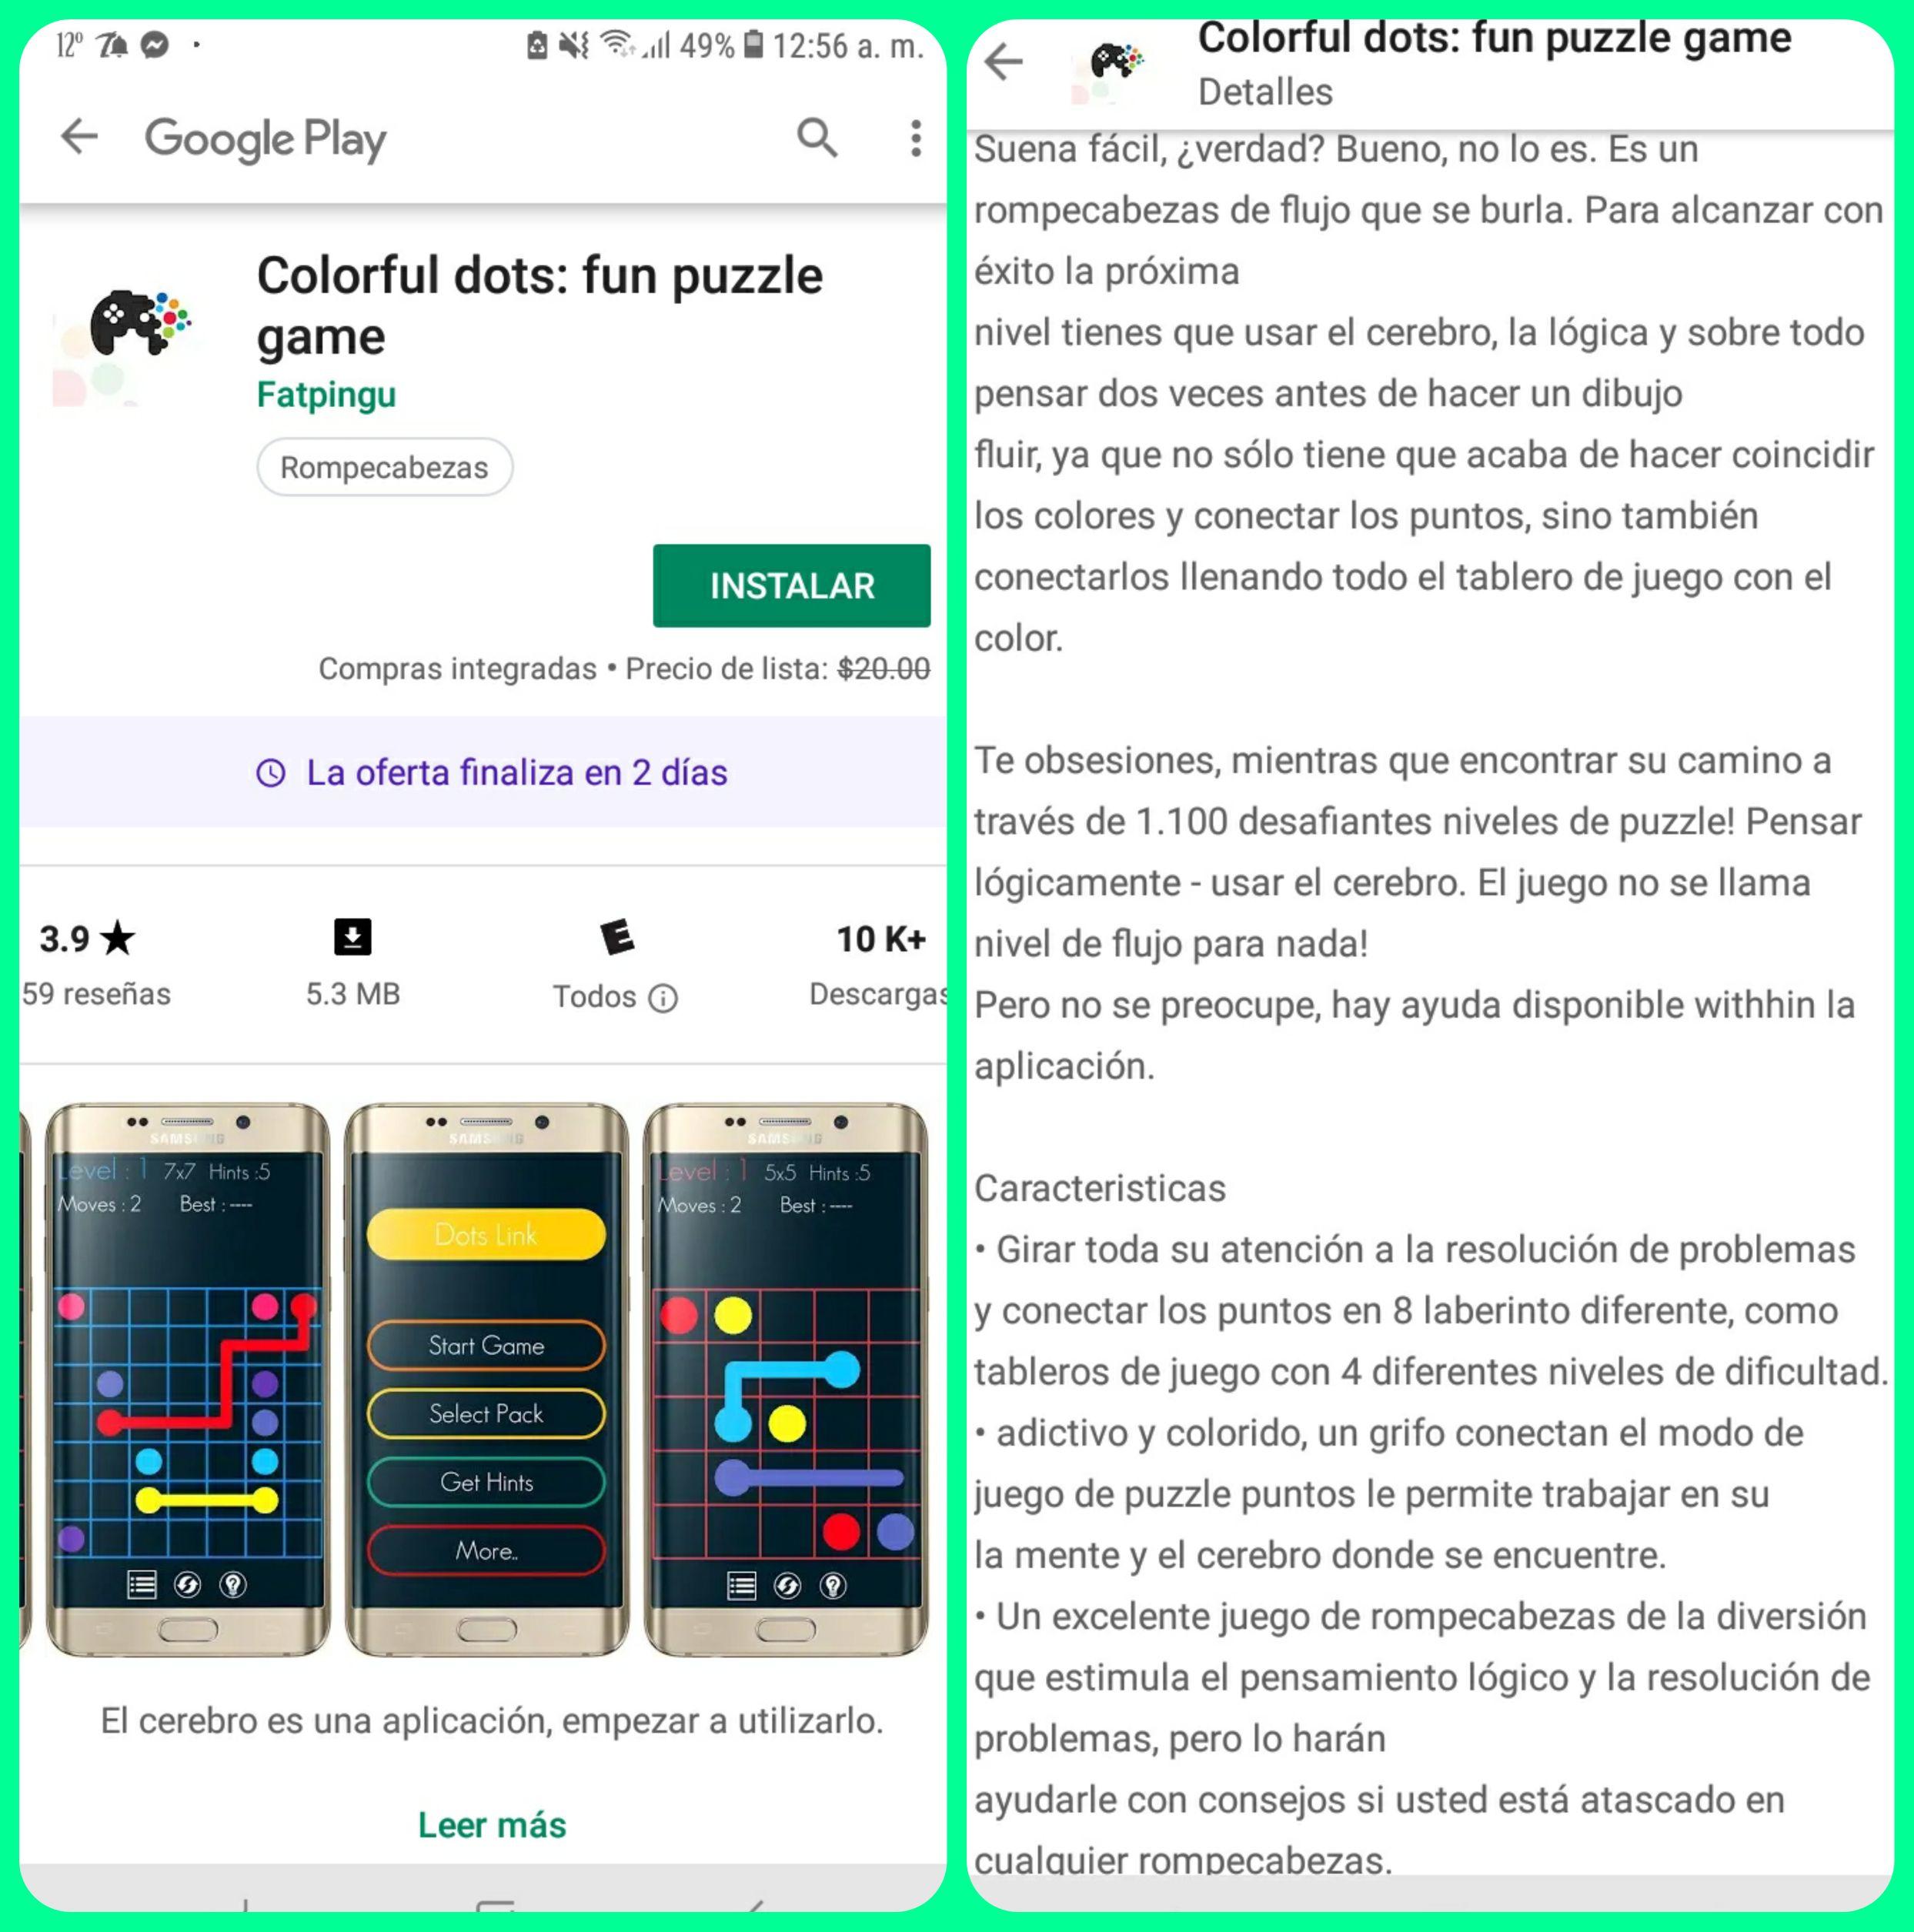 Google Play: Colorful Gratis